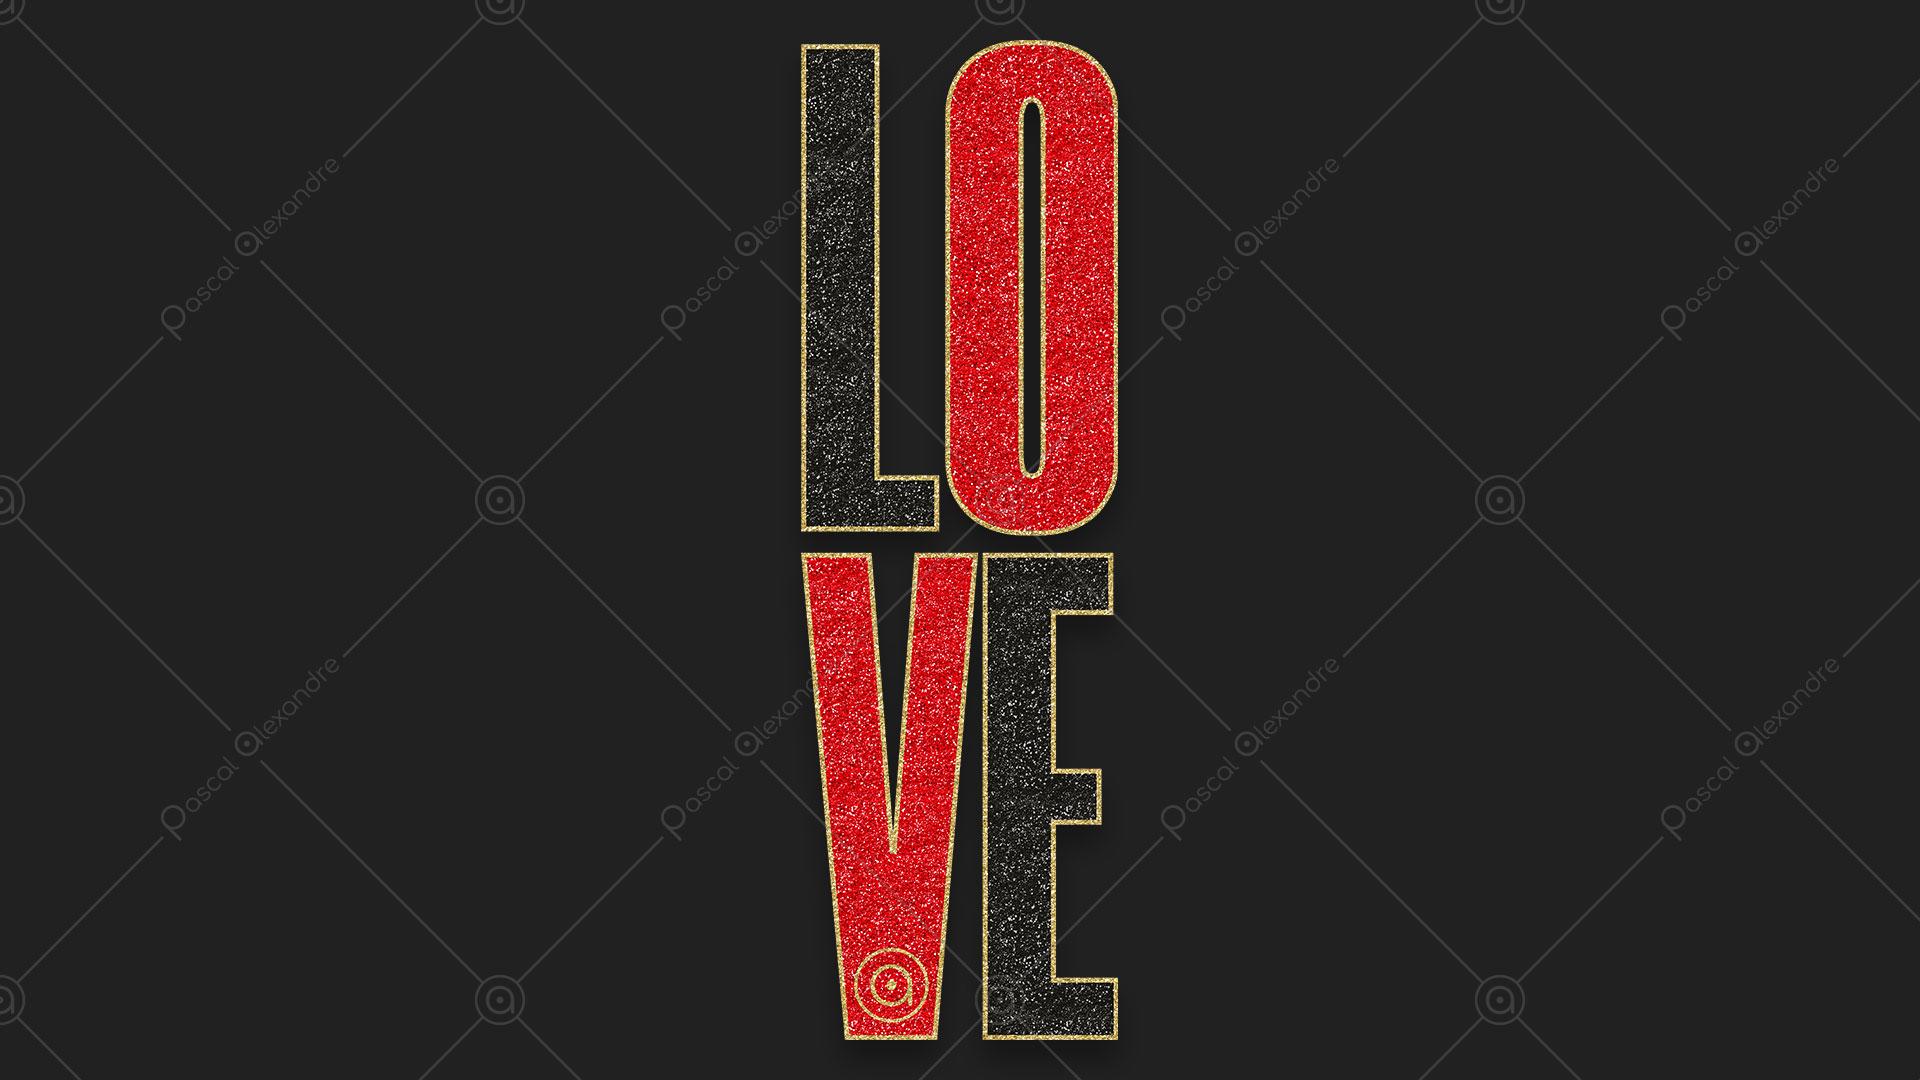 Love 1554574504